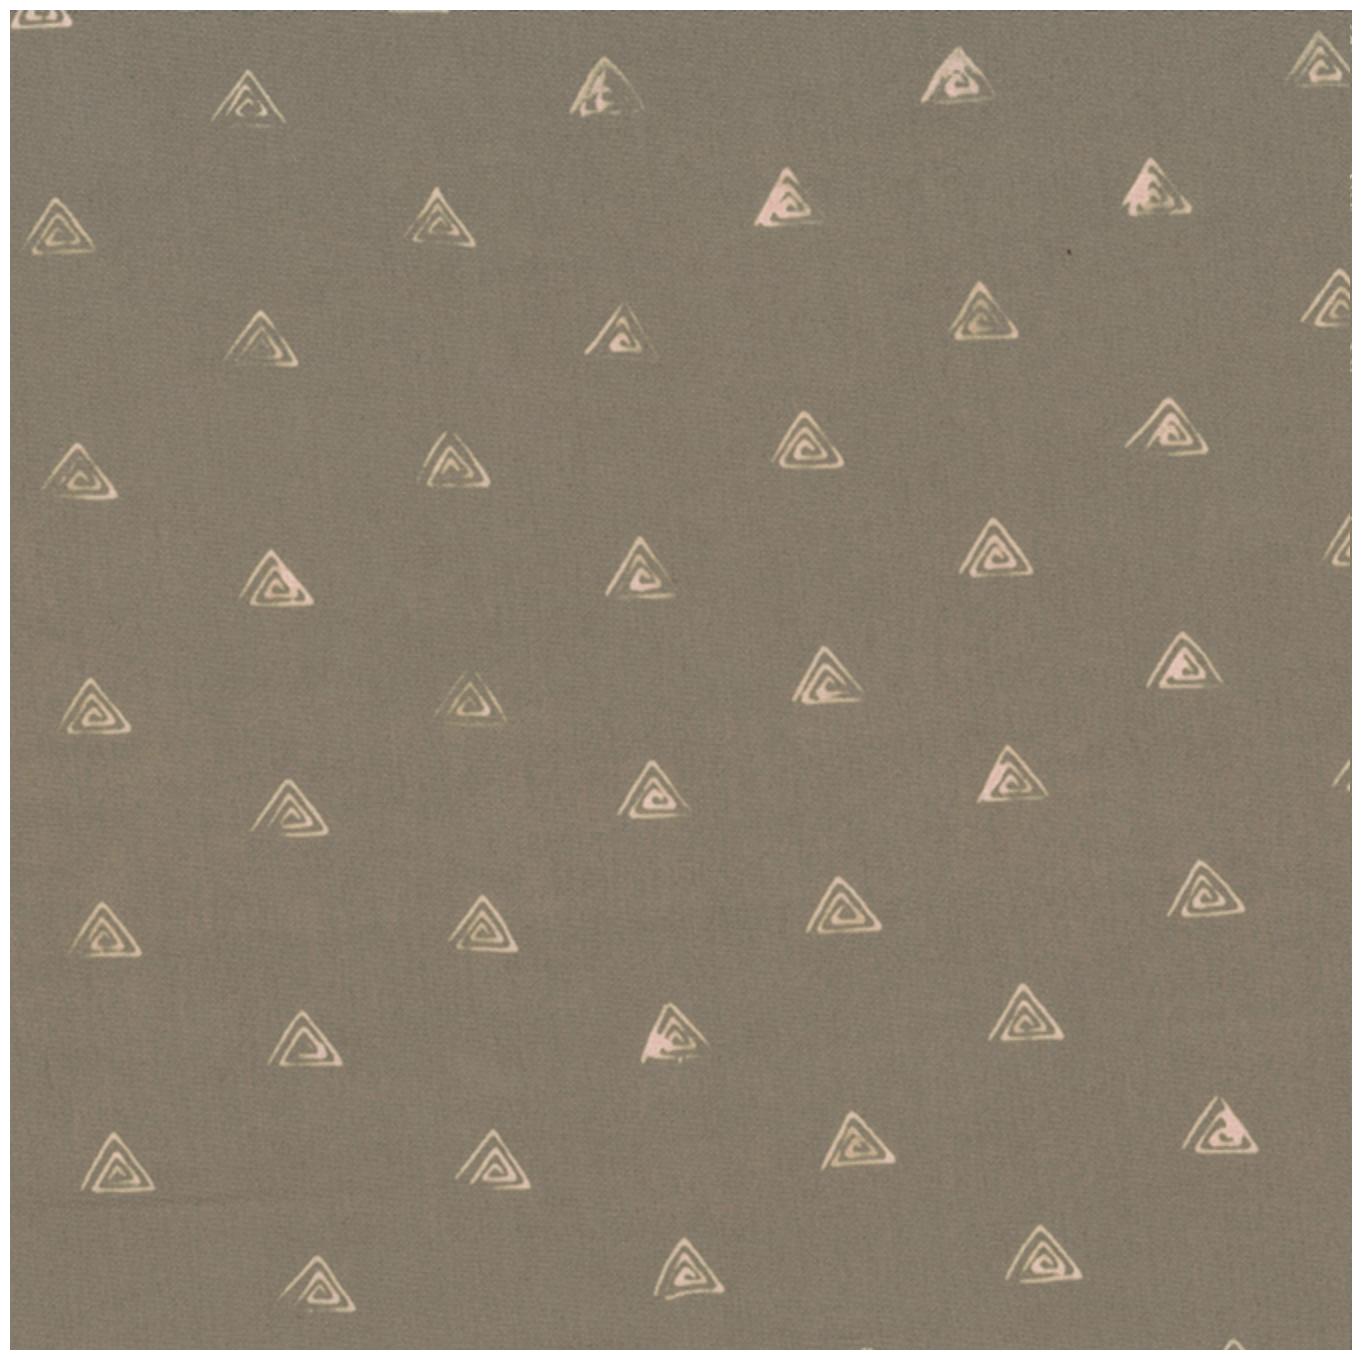 Triangles Beachsand - Hand Dyed Batiks - Me + You Hoffman Fabrics 131-544